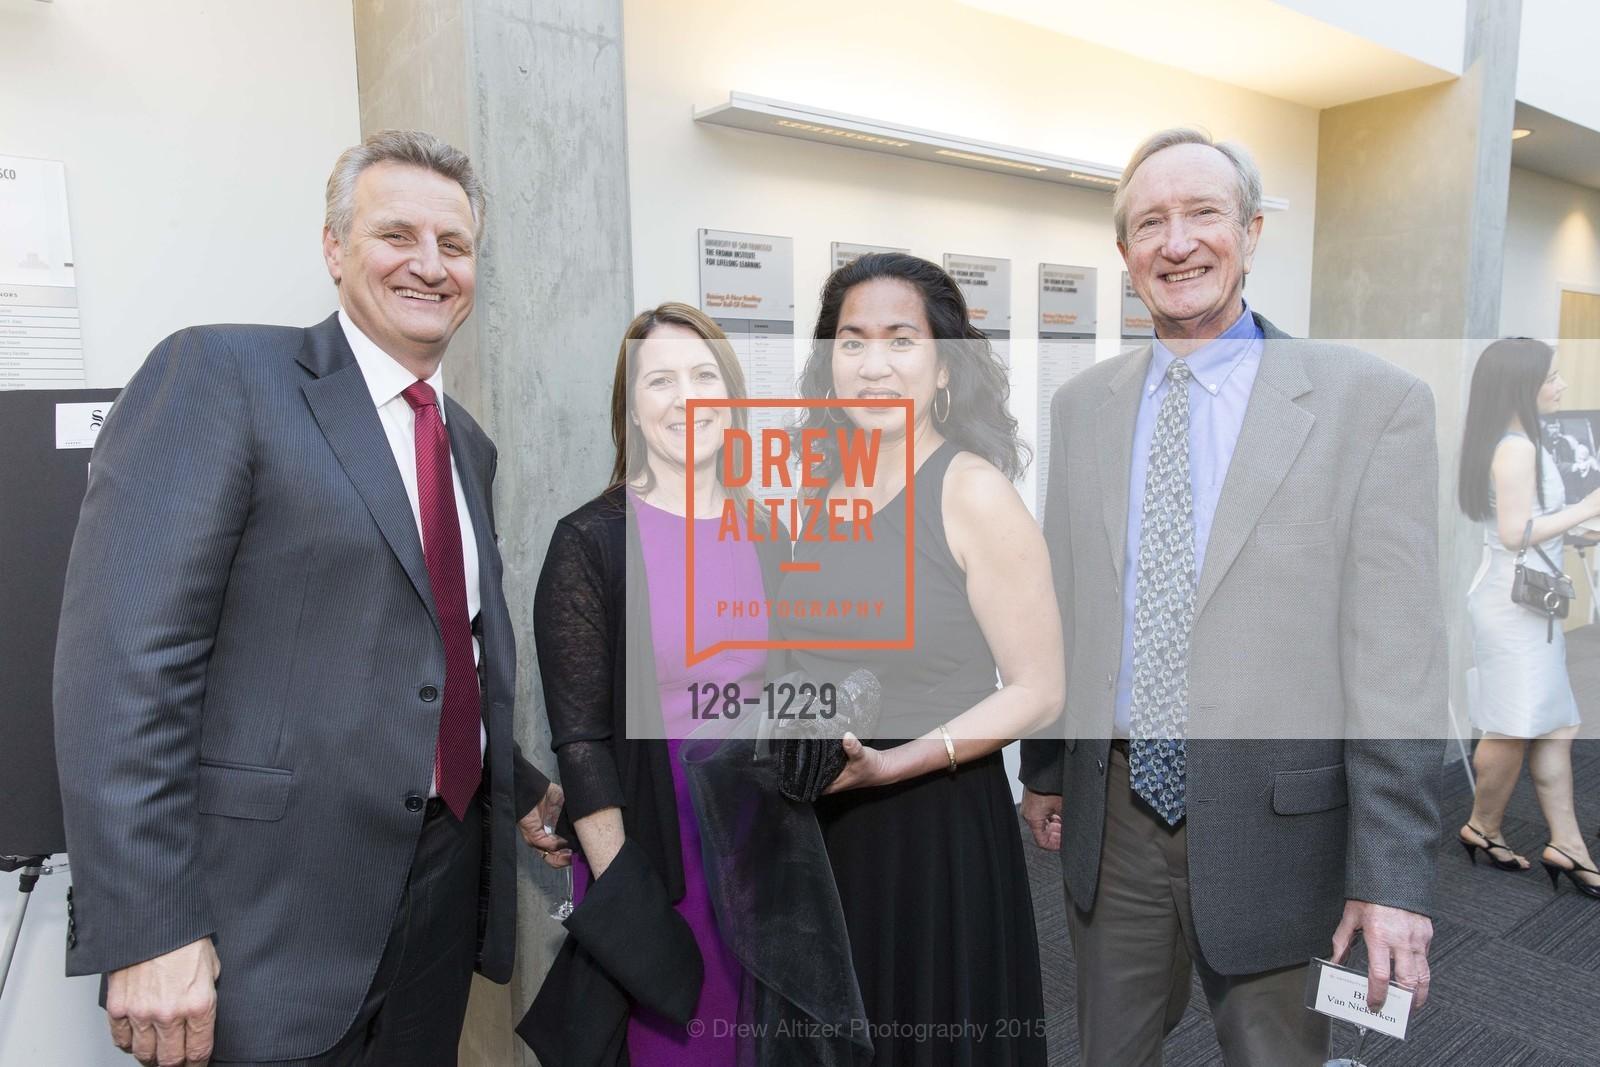 Jeff Johnson, Jennifer Kirschbaum, Kay Phan, Bill van Niekerken, Photo #128-1229